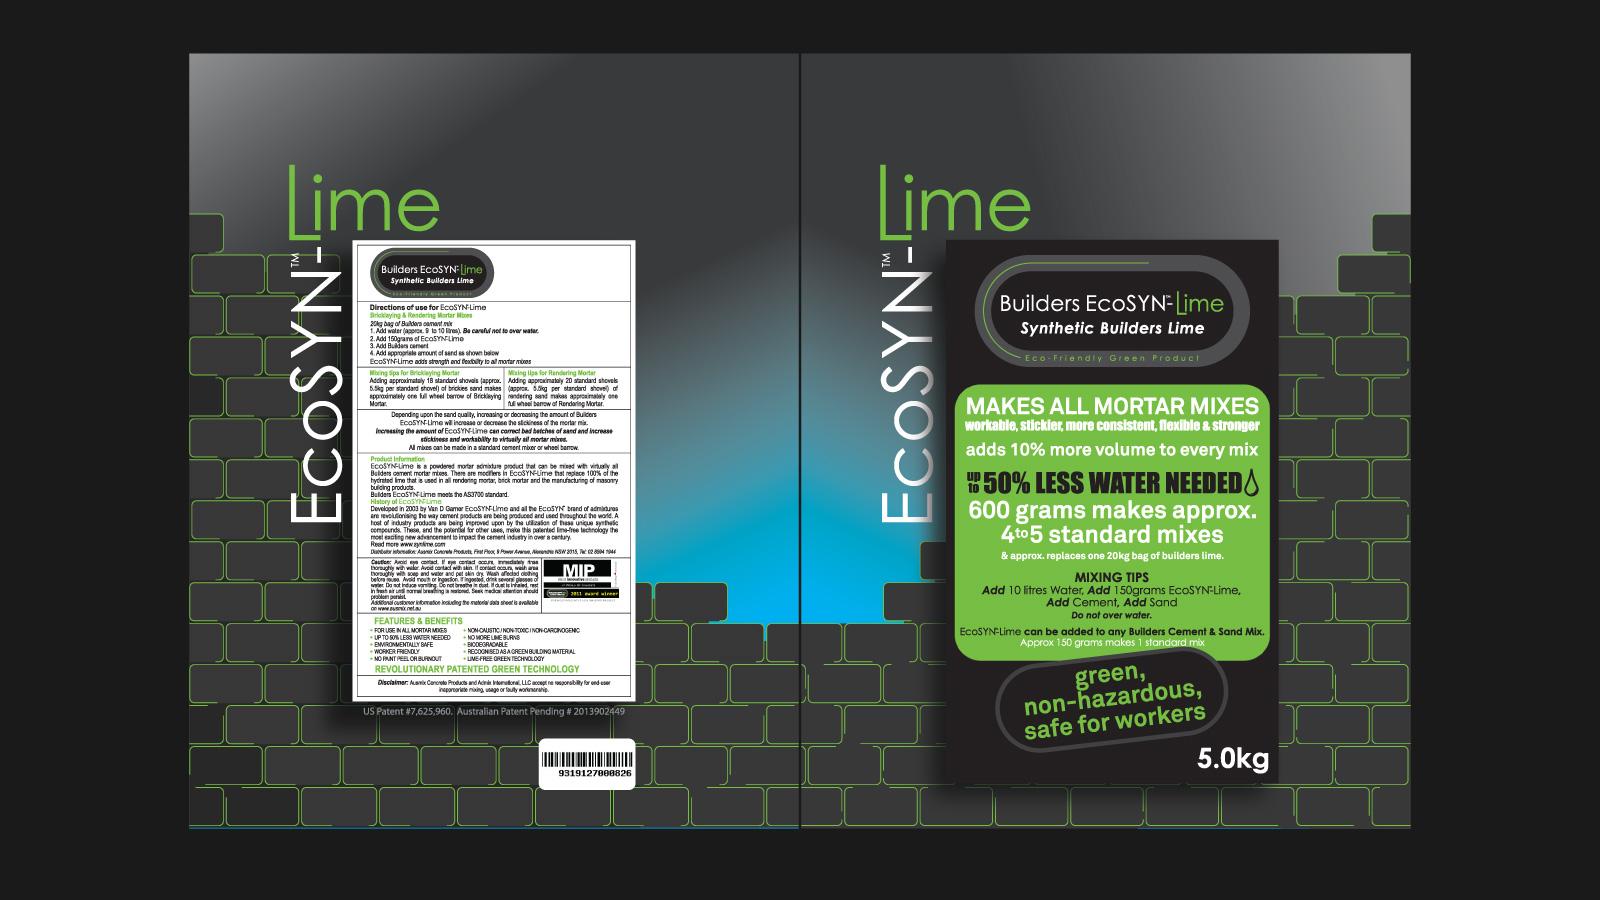 synlime-branding2